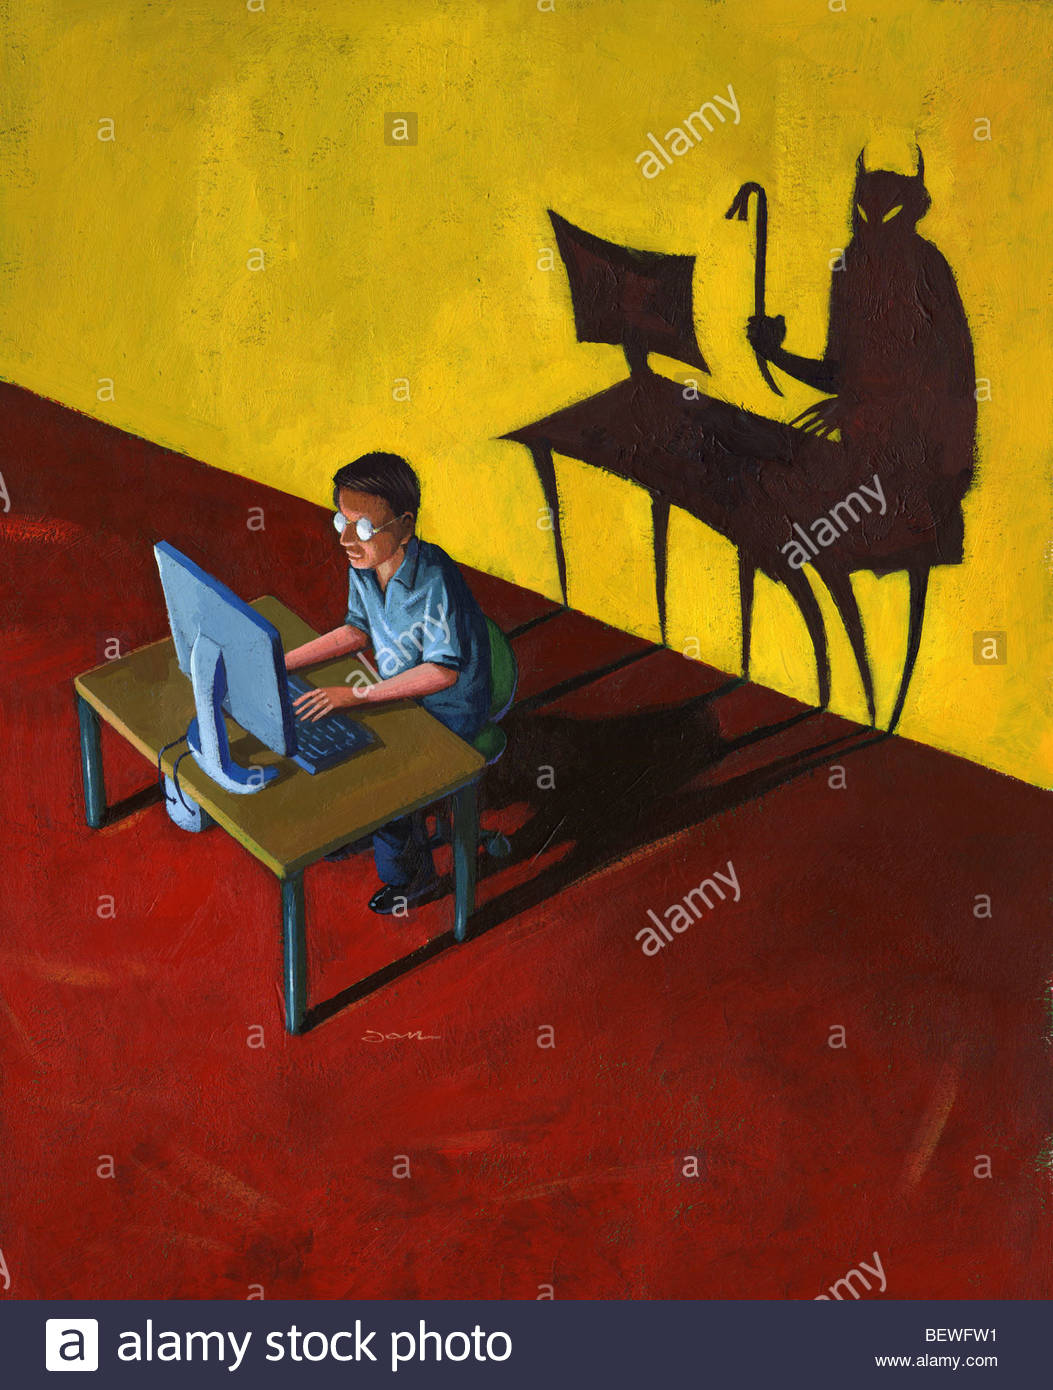 Devil lurking behind man on computer - Stock Image